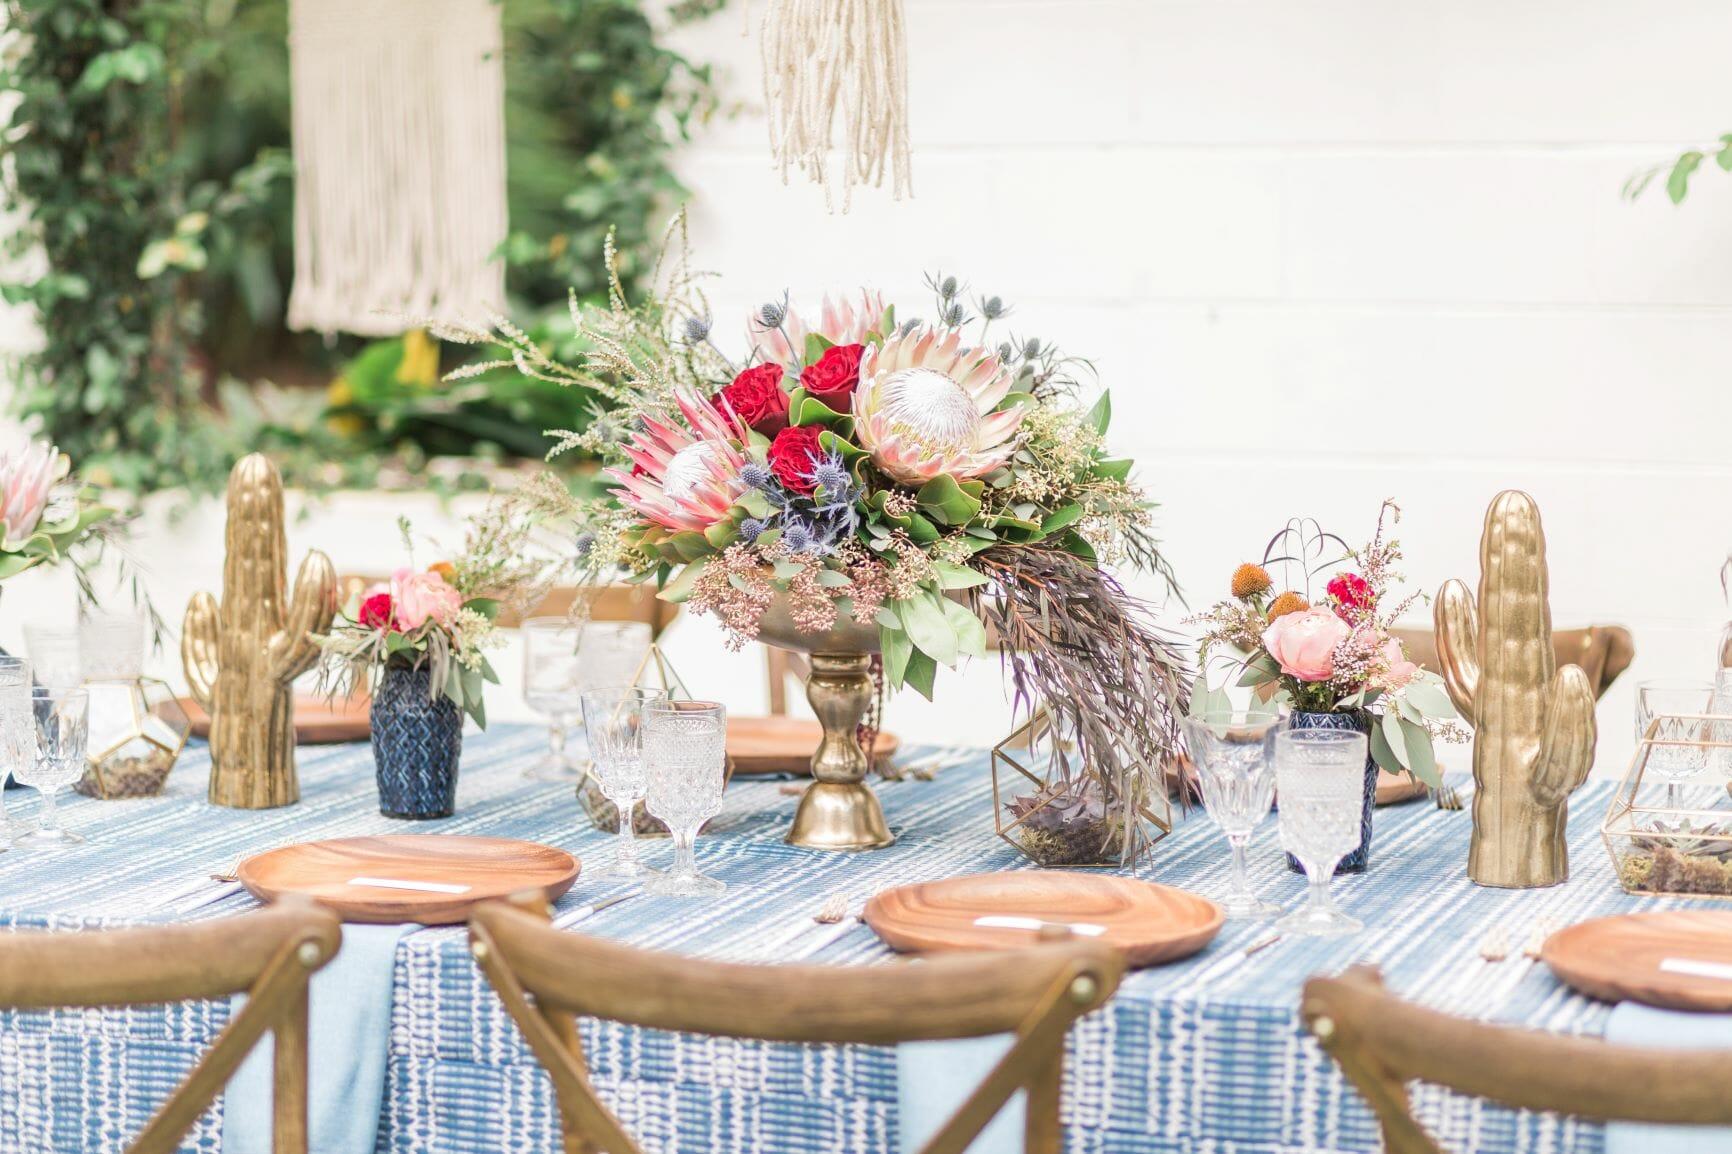 Blue Indigo Inspired Garden Dinner Party Table Setting Decor